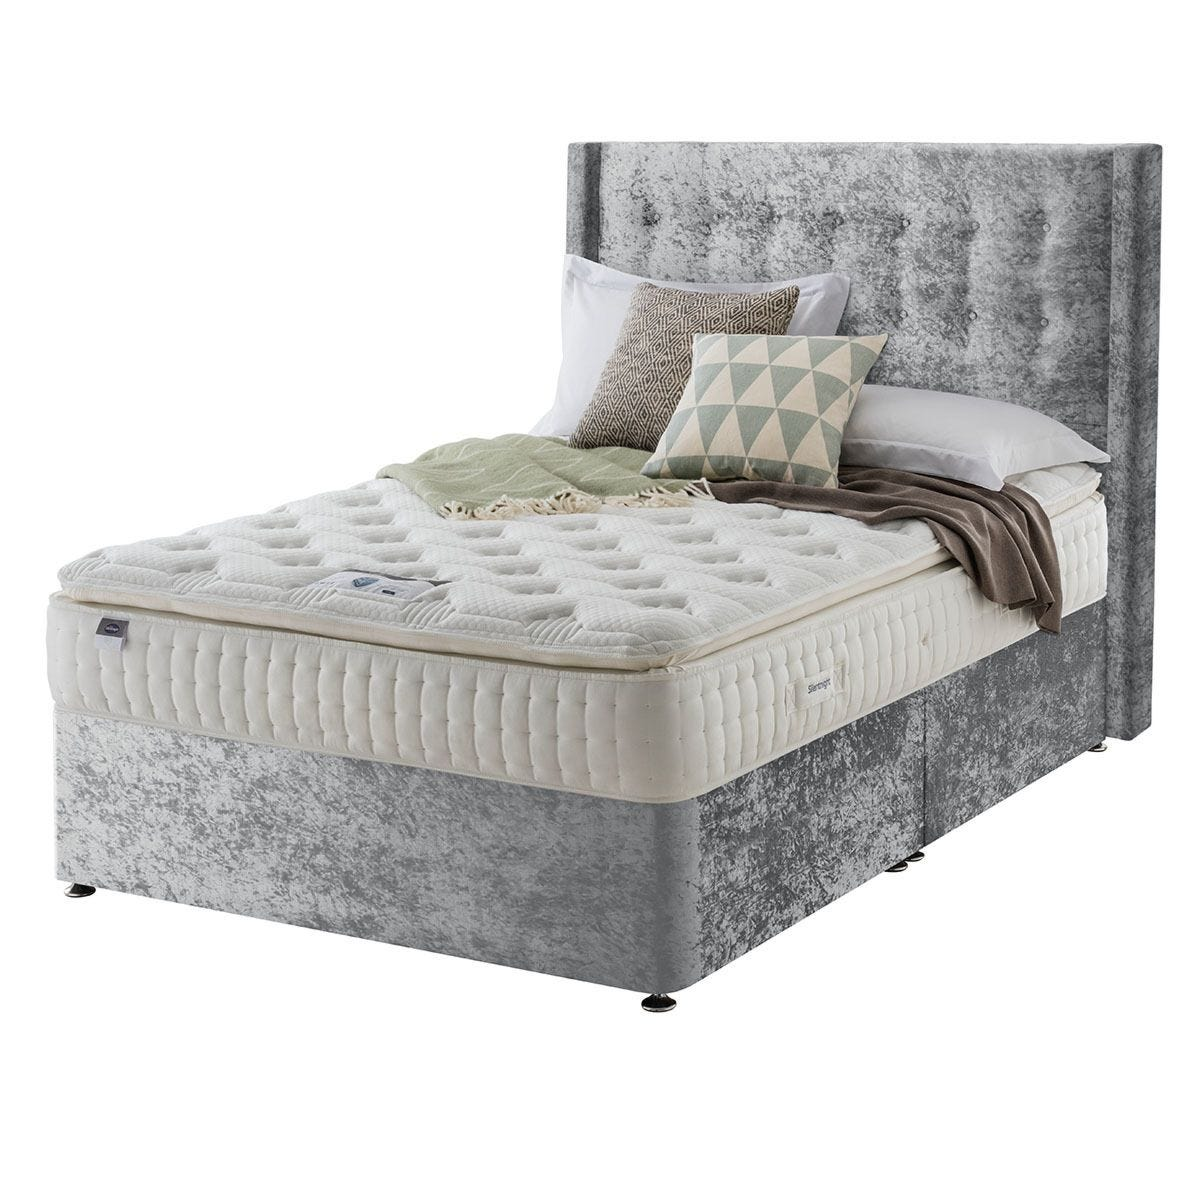 Silentnight Mirapocket Latex 1000 Non Storage Divan Bed - Crushed Velvet Light Grey Super King